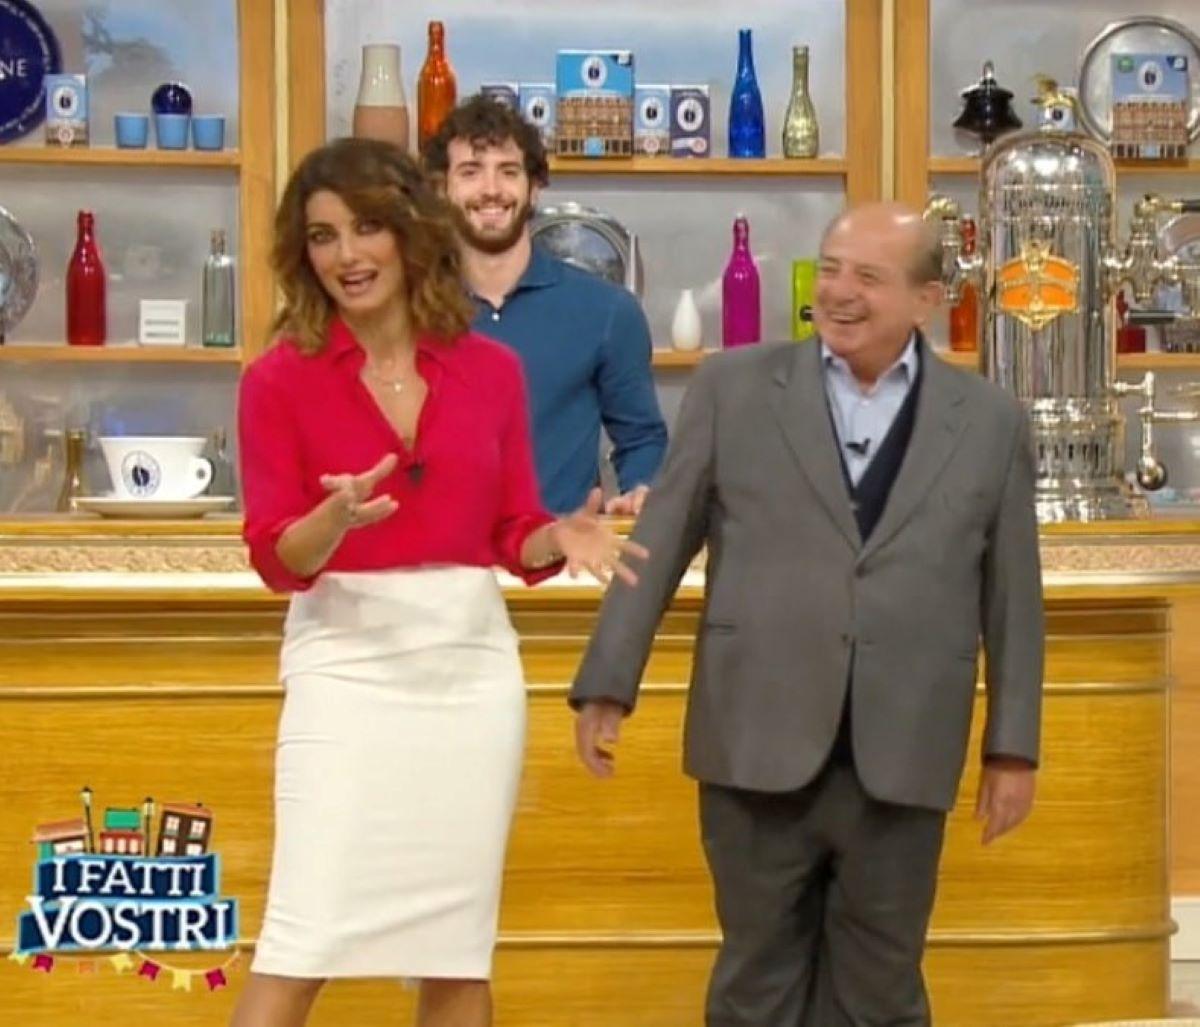 Giancarlo Magalli I Fatti Vostri Motivi Addio